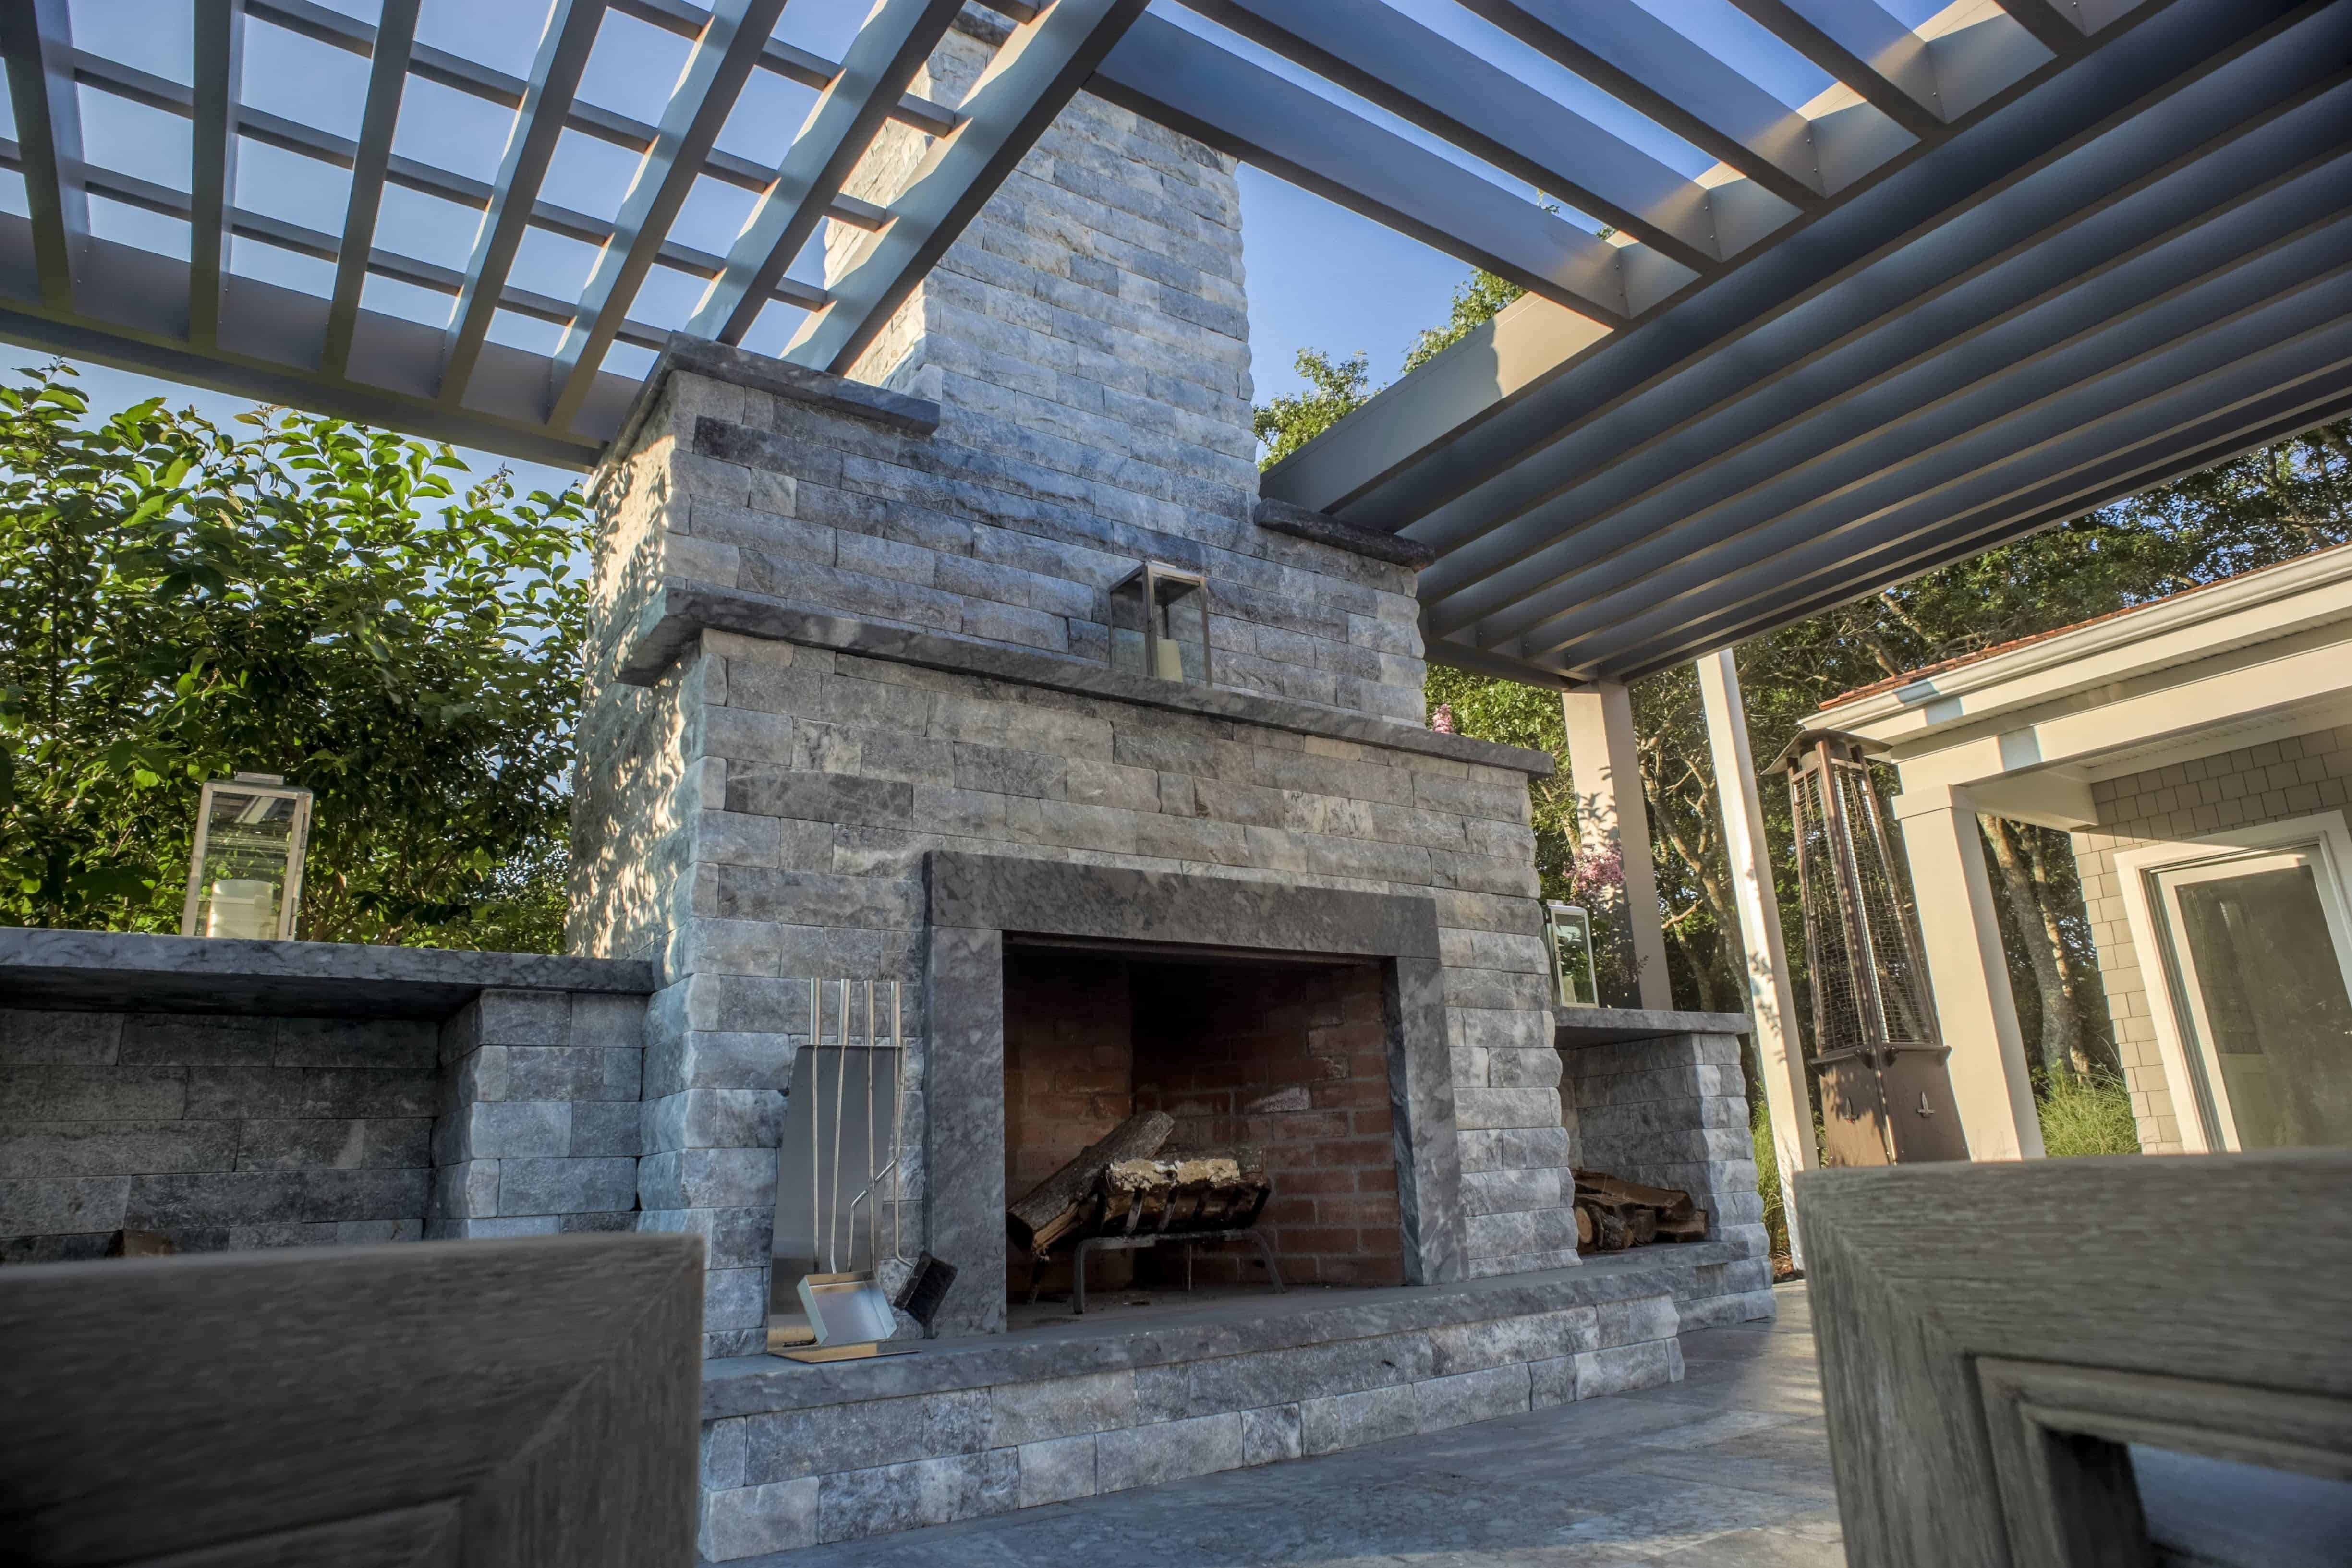 Grand Outdoor Fireplace with Pergola - Marmiro Stone Deep Blue - Southampton, Long Island NY